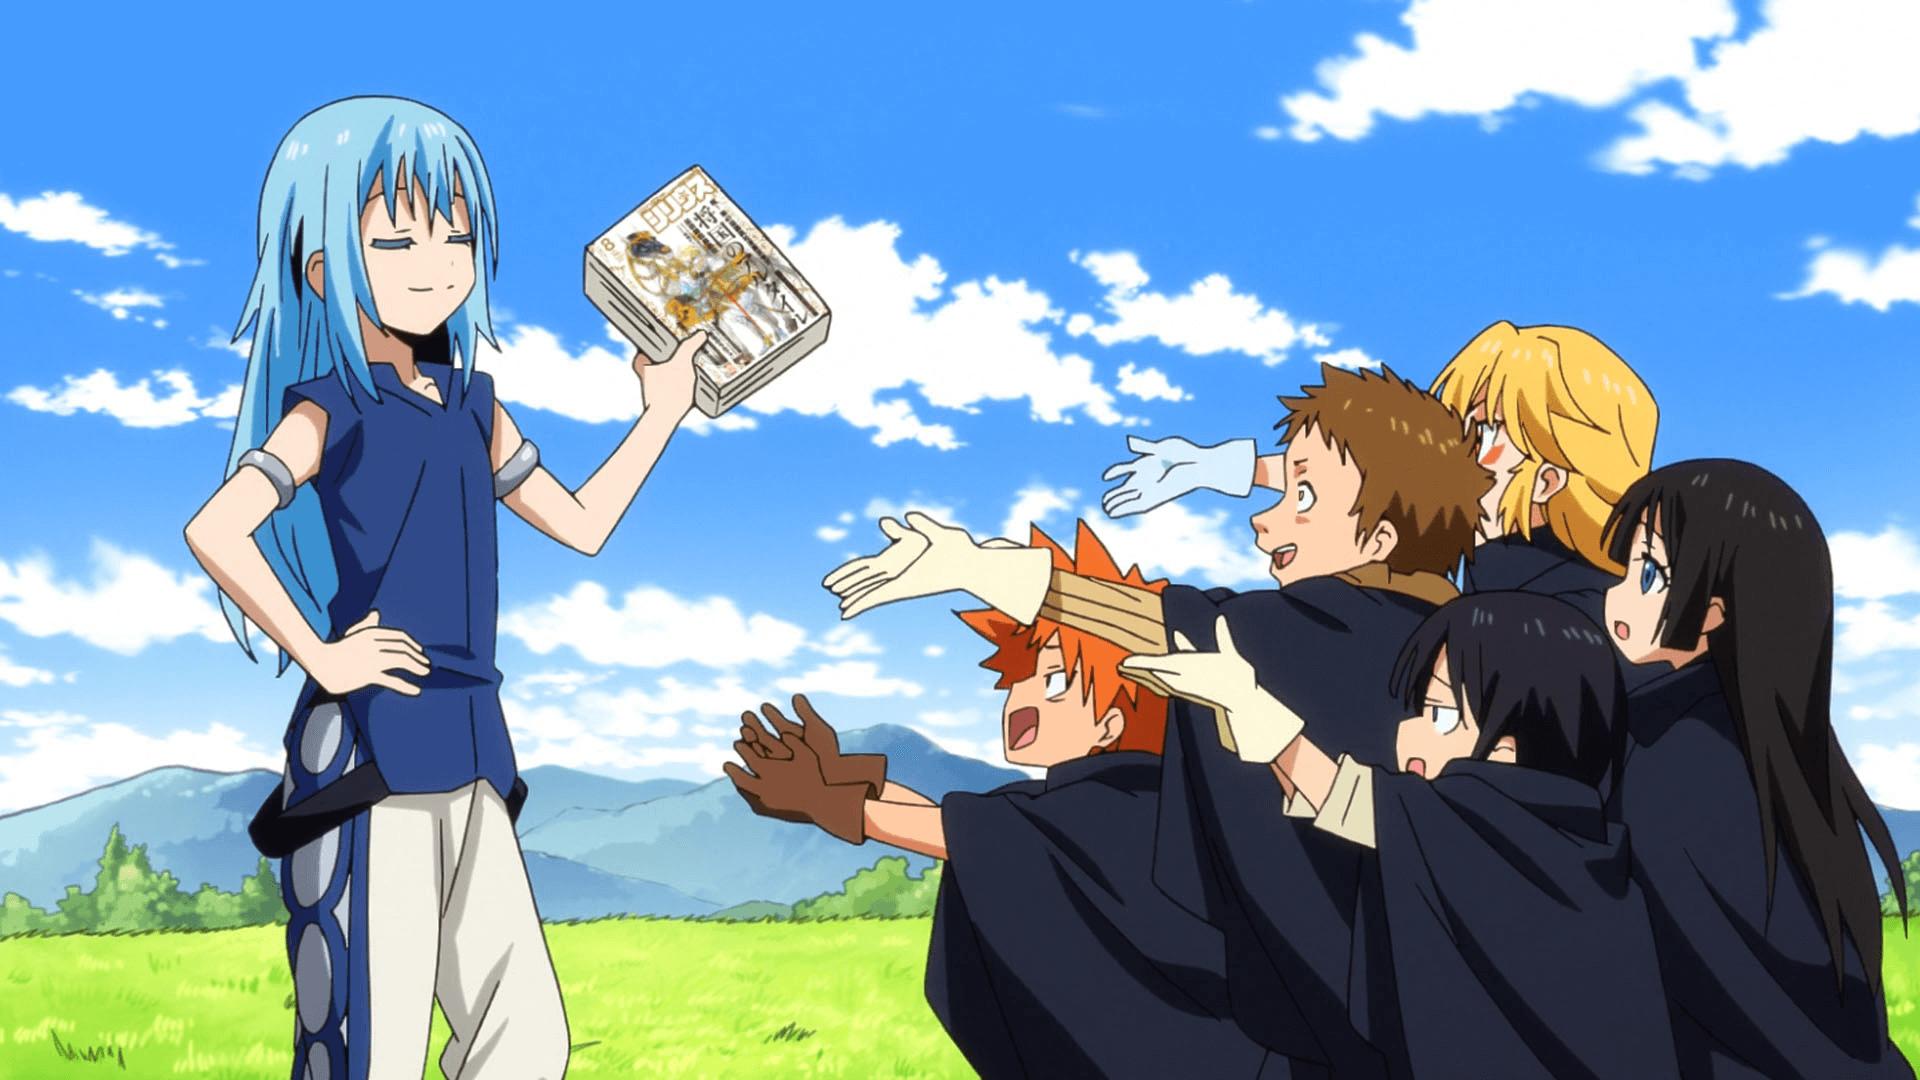 Shizu-san's Students